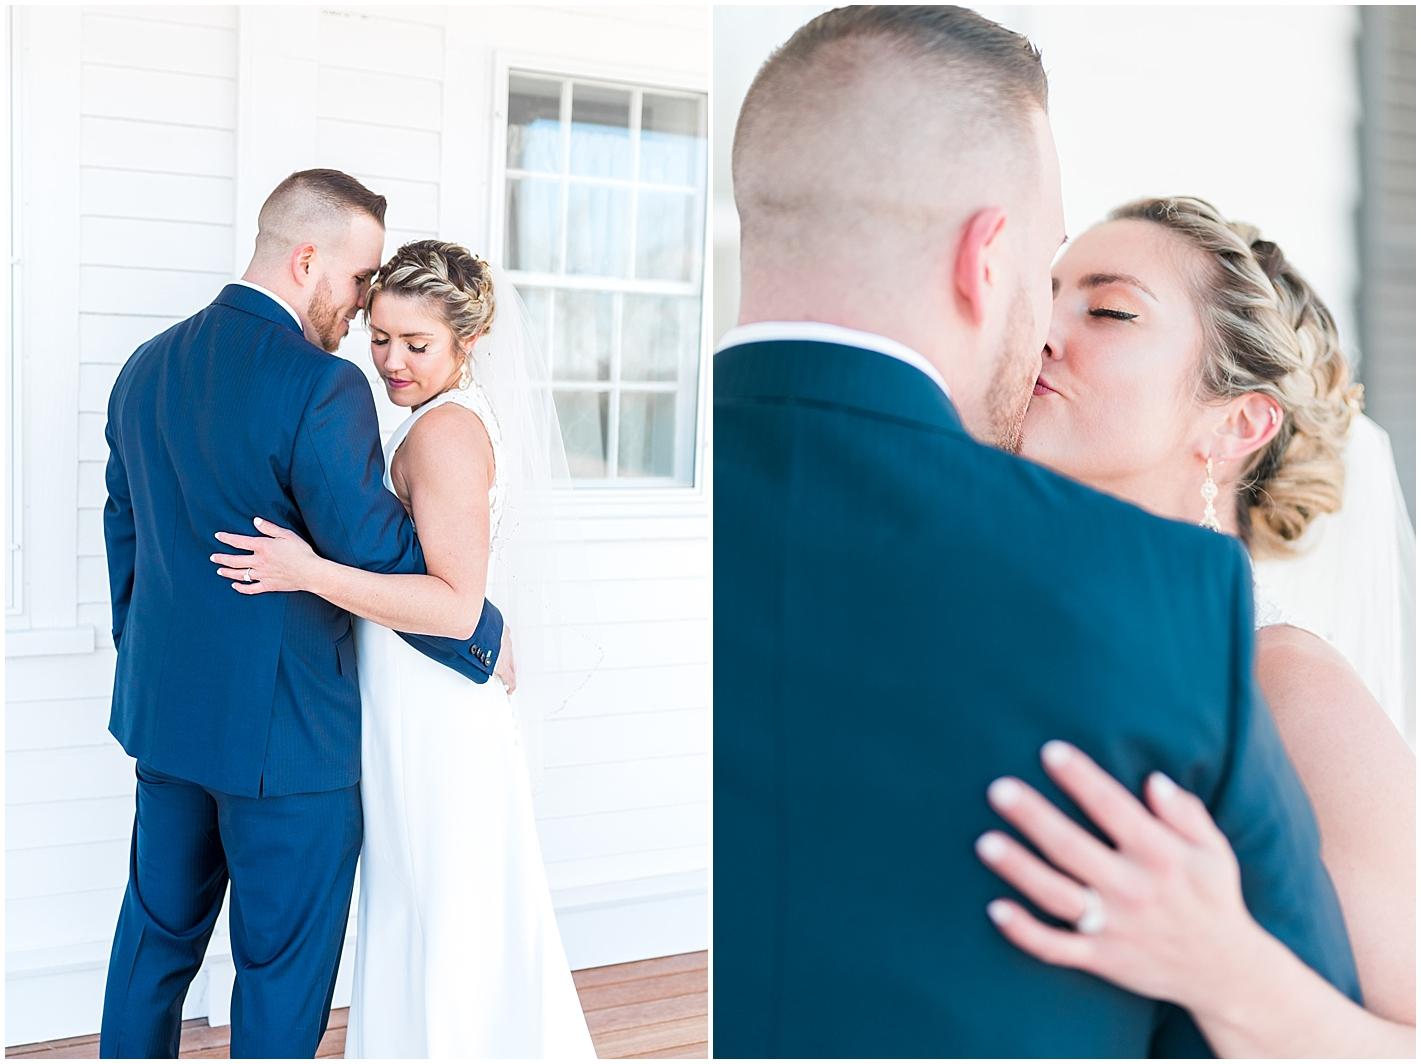 Boston Wedding Photographer Photos by Alyssa Parker Photography